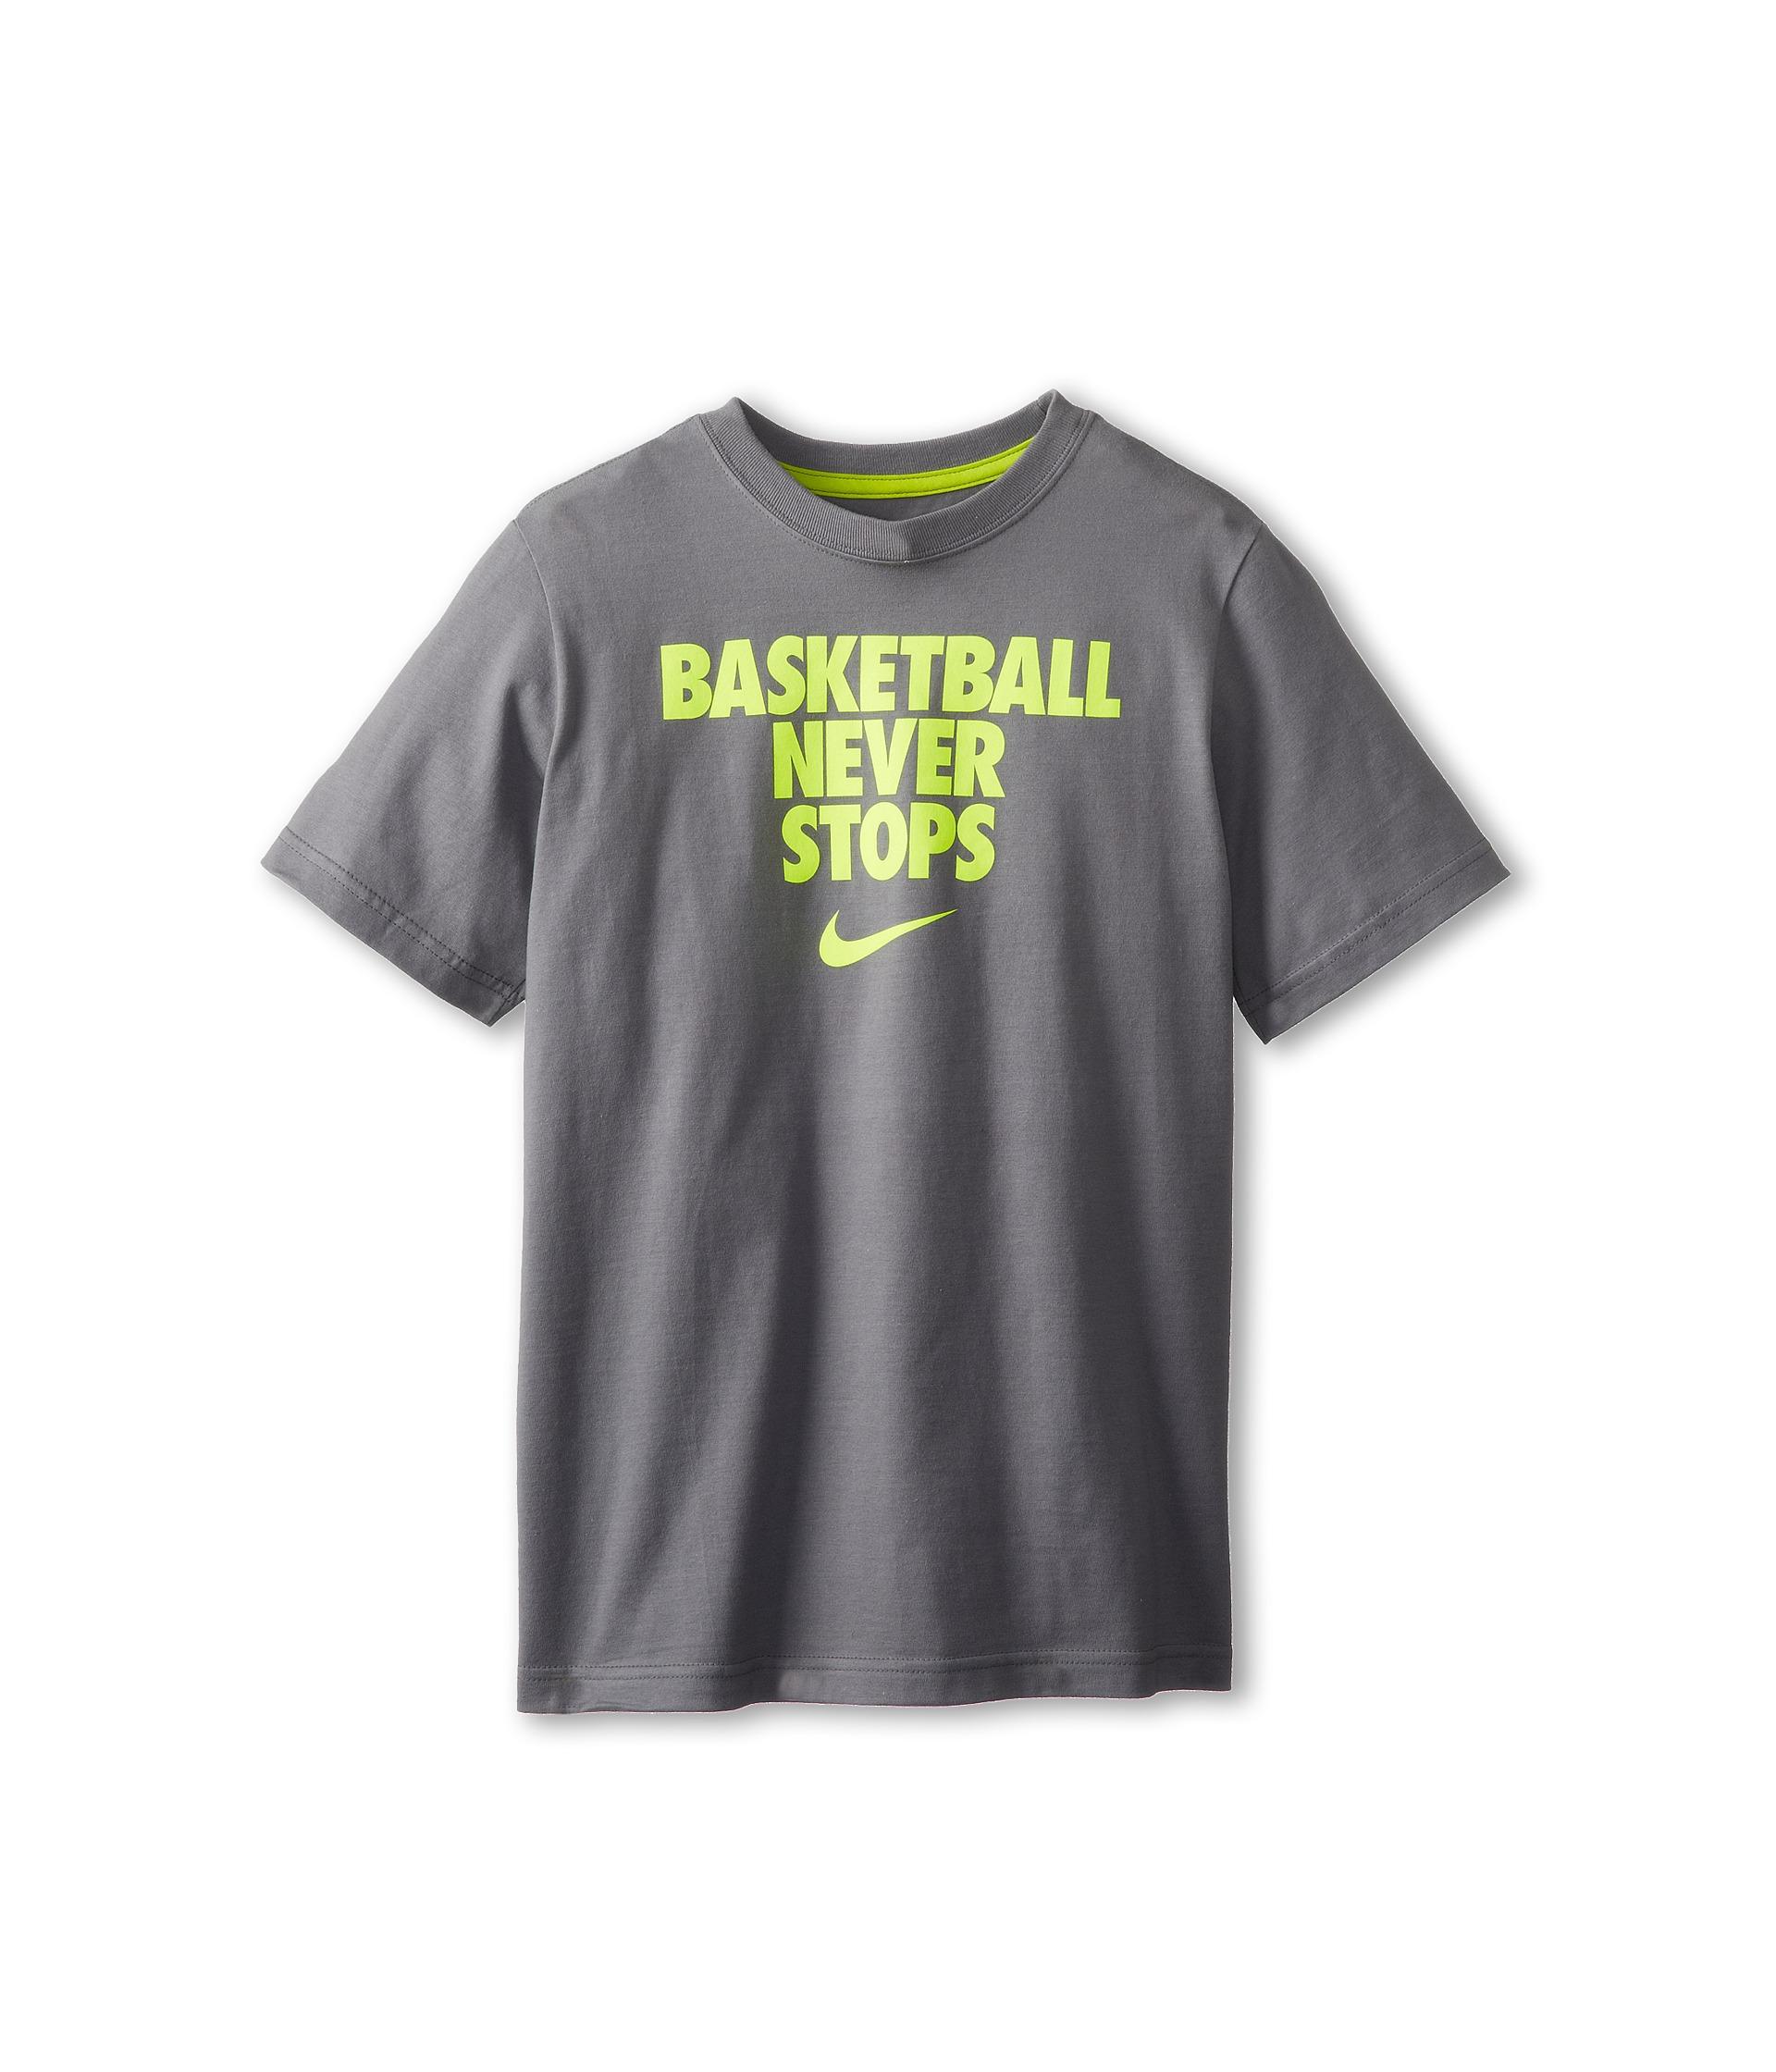 Duke Basketball Never Stops Shirt - Viewing Gallery